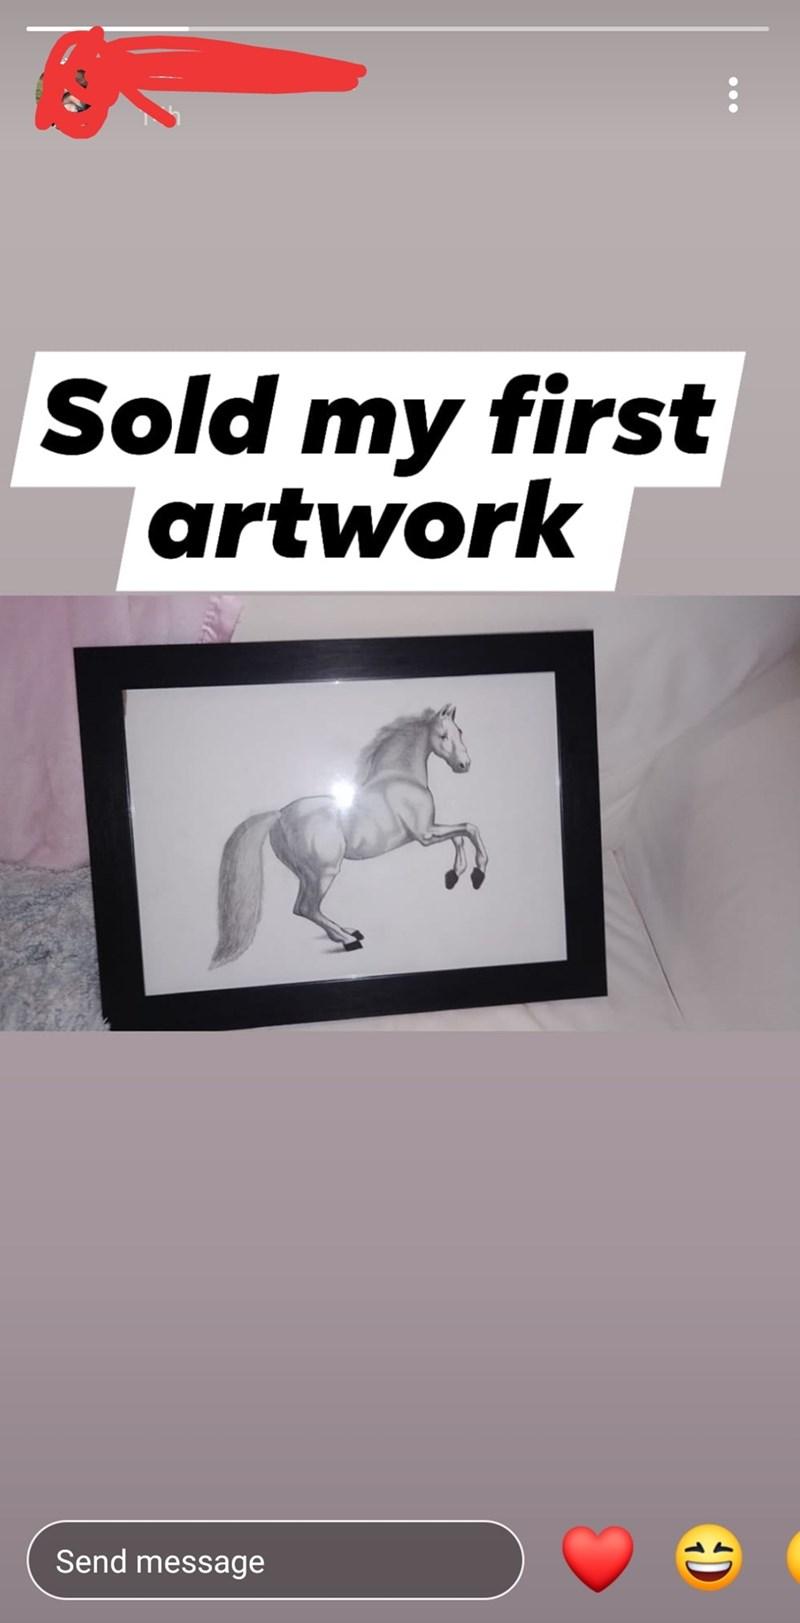 White - Sold my first artwork Send message